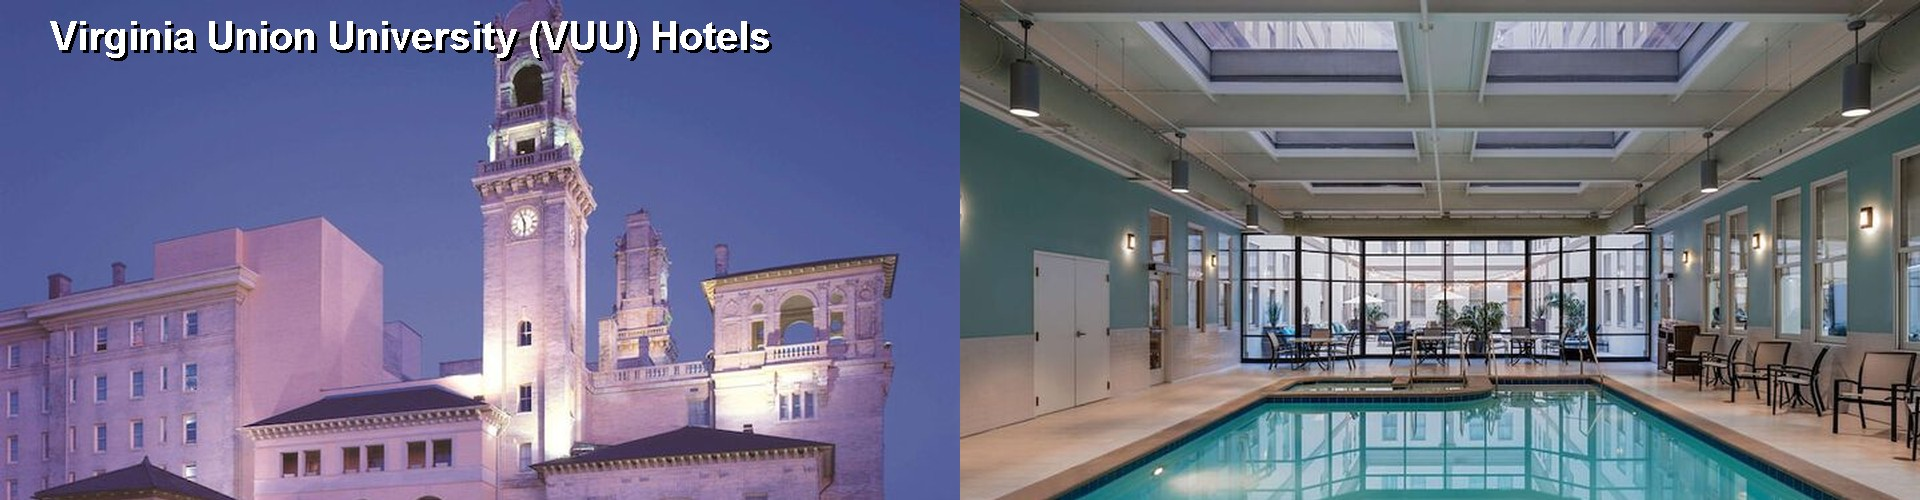 5 Best Hotels Near Virginia Union University (VUU) Part 49